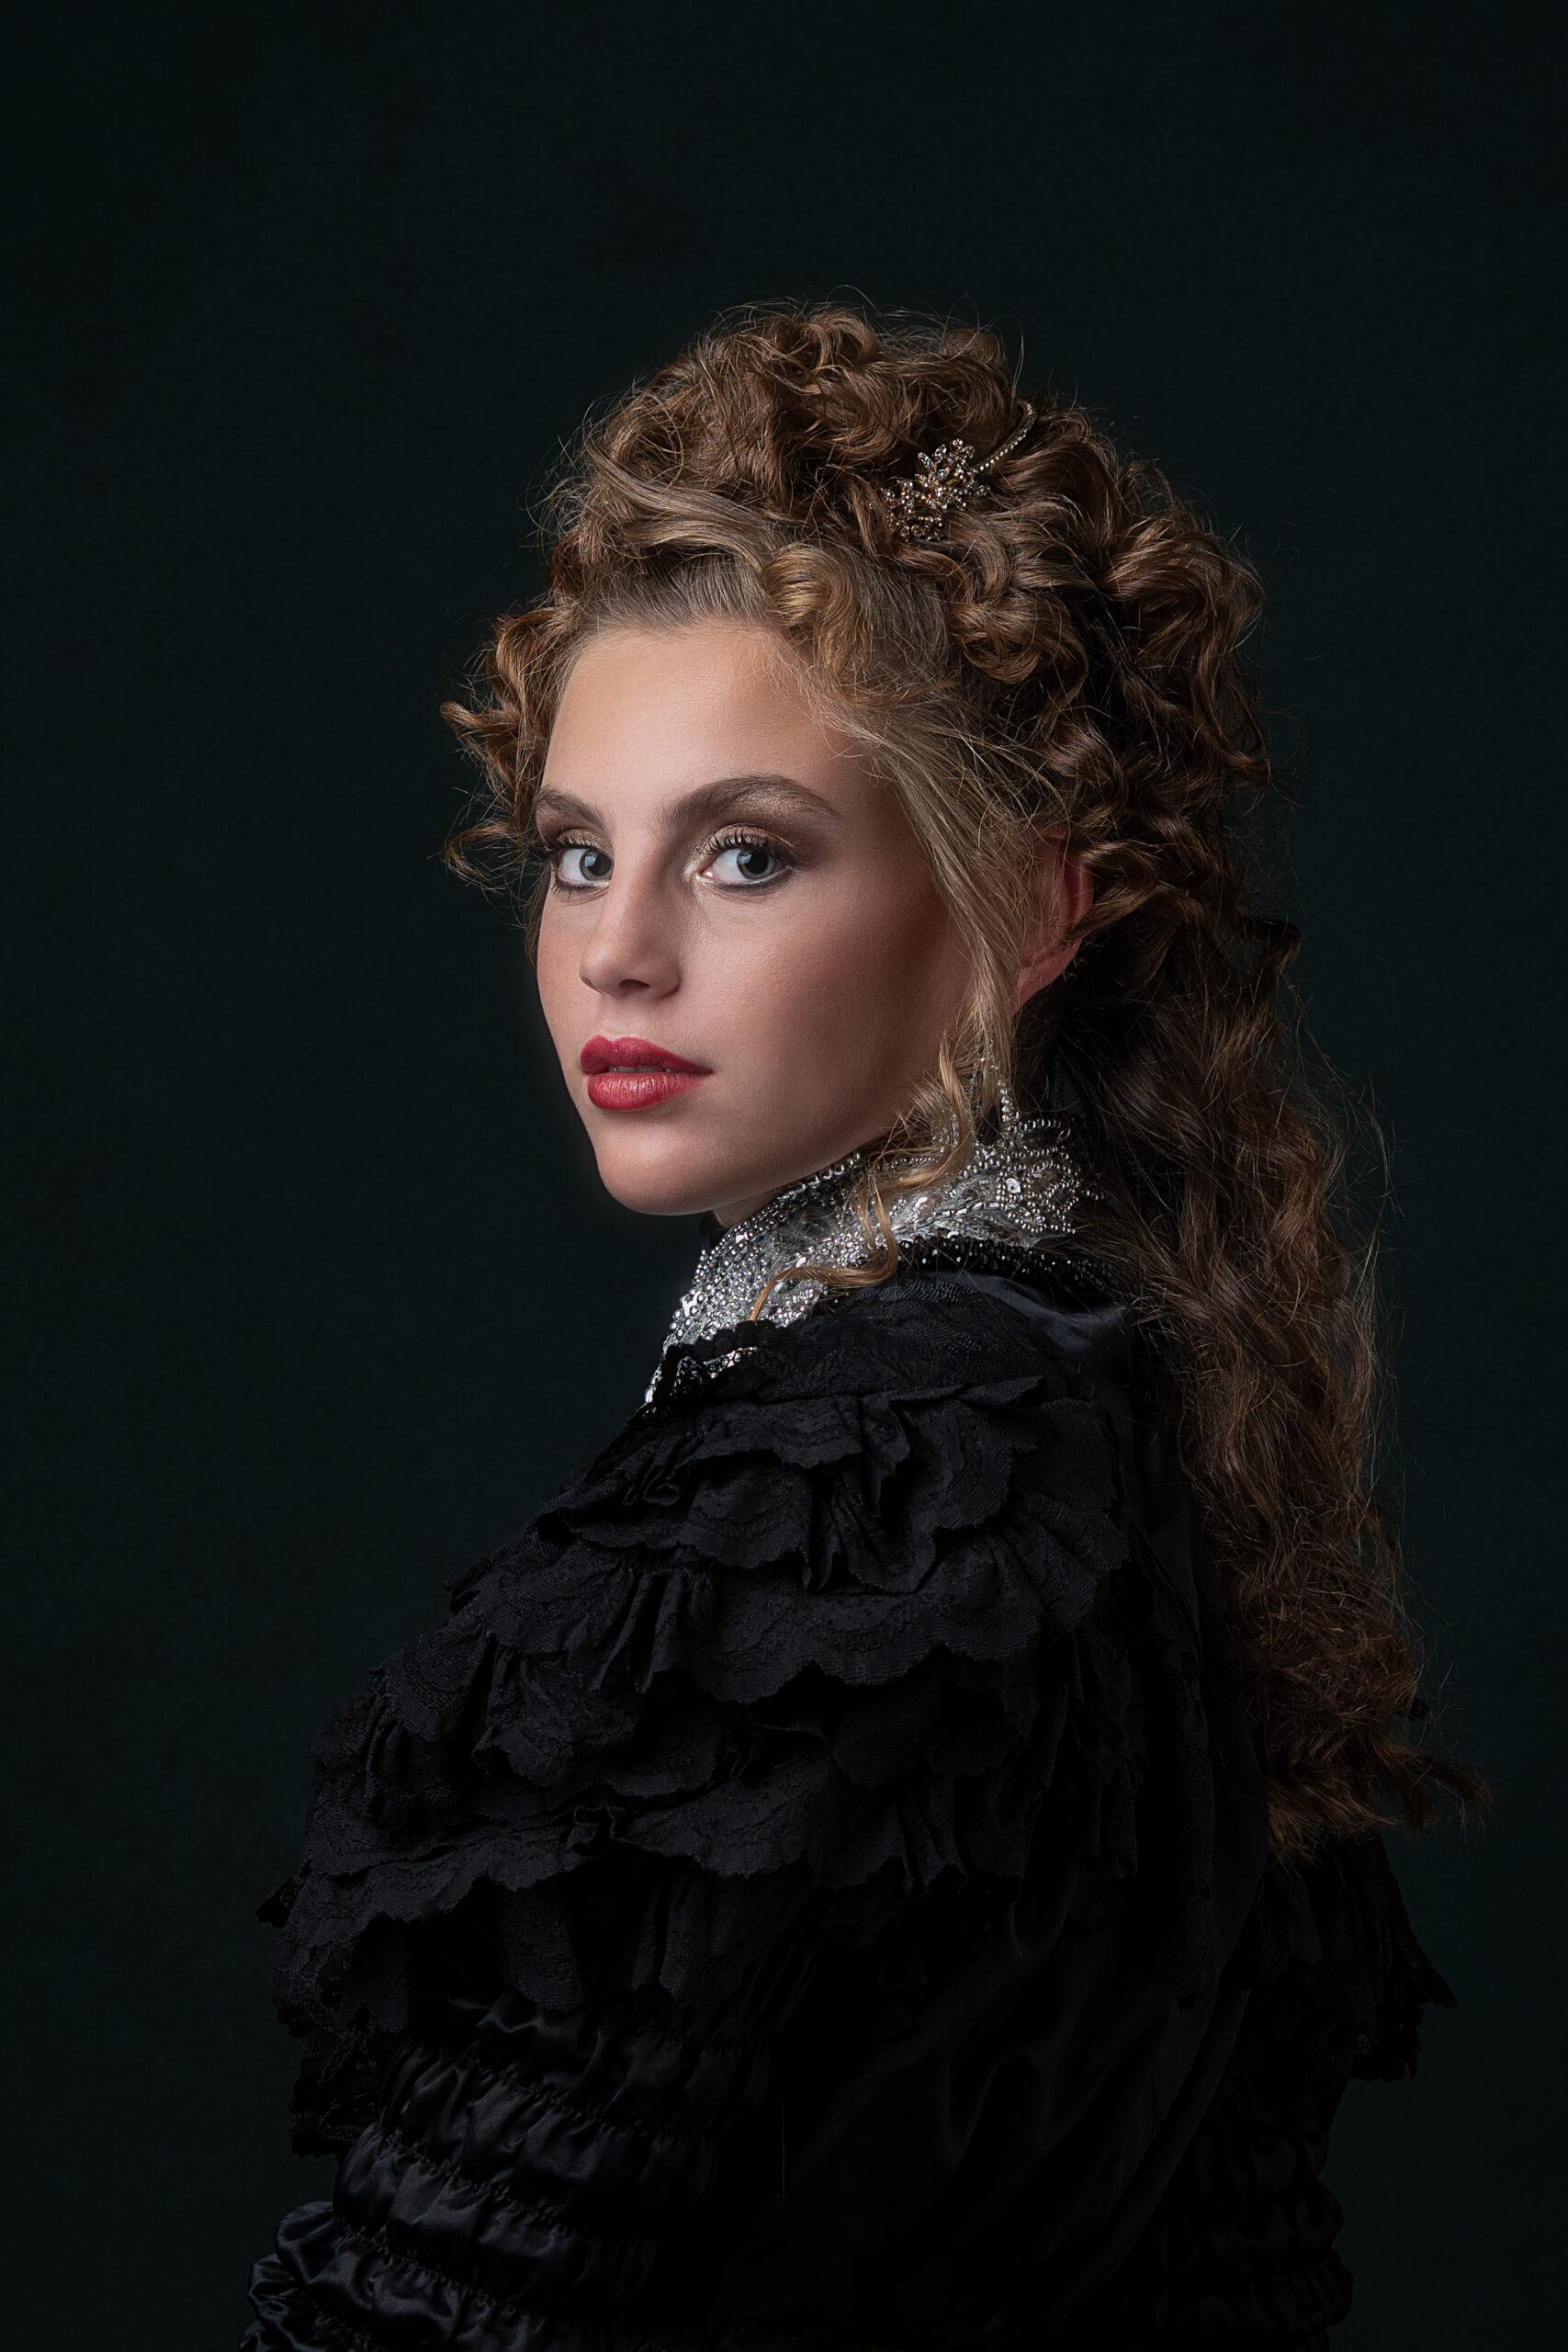 Portret Hollandse Meesters anno 2020